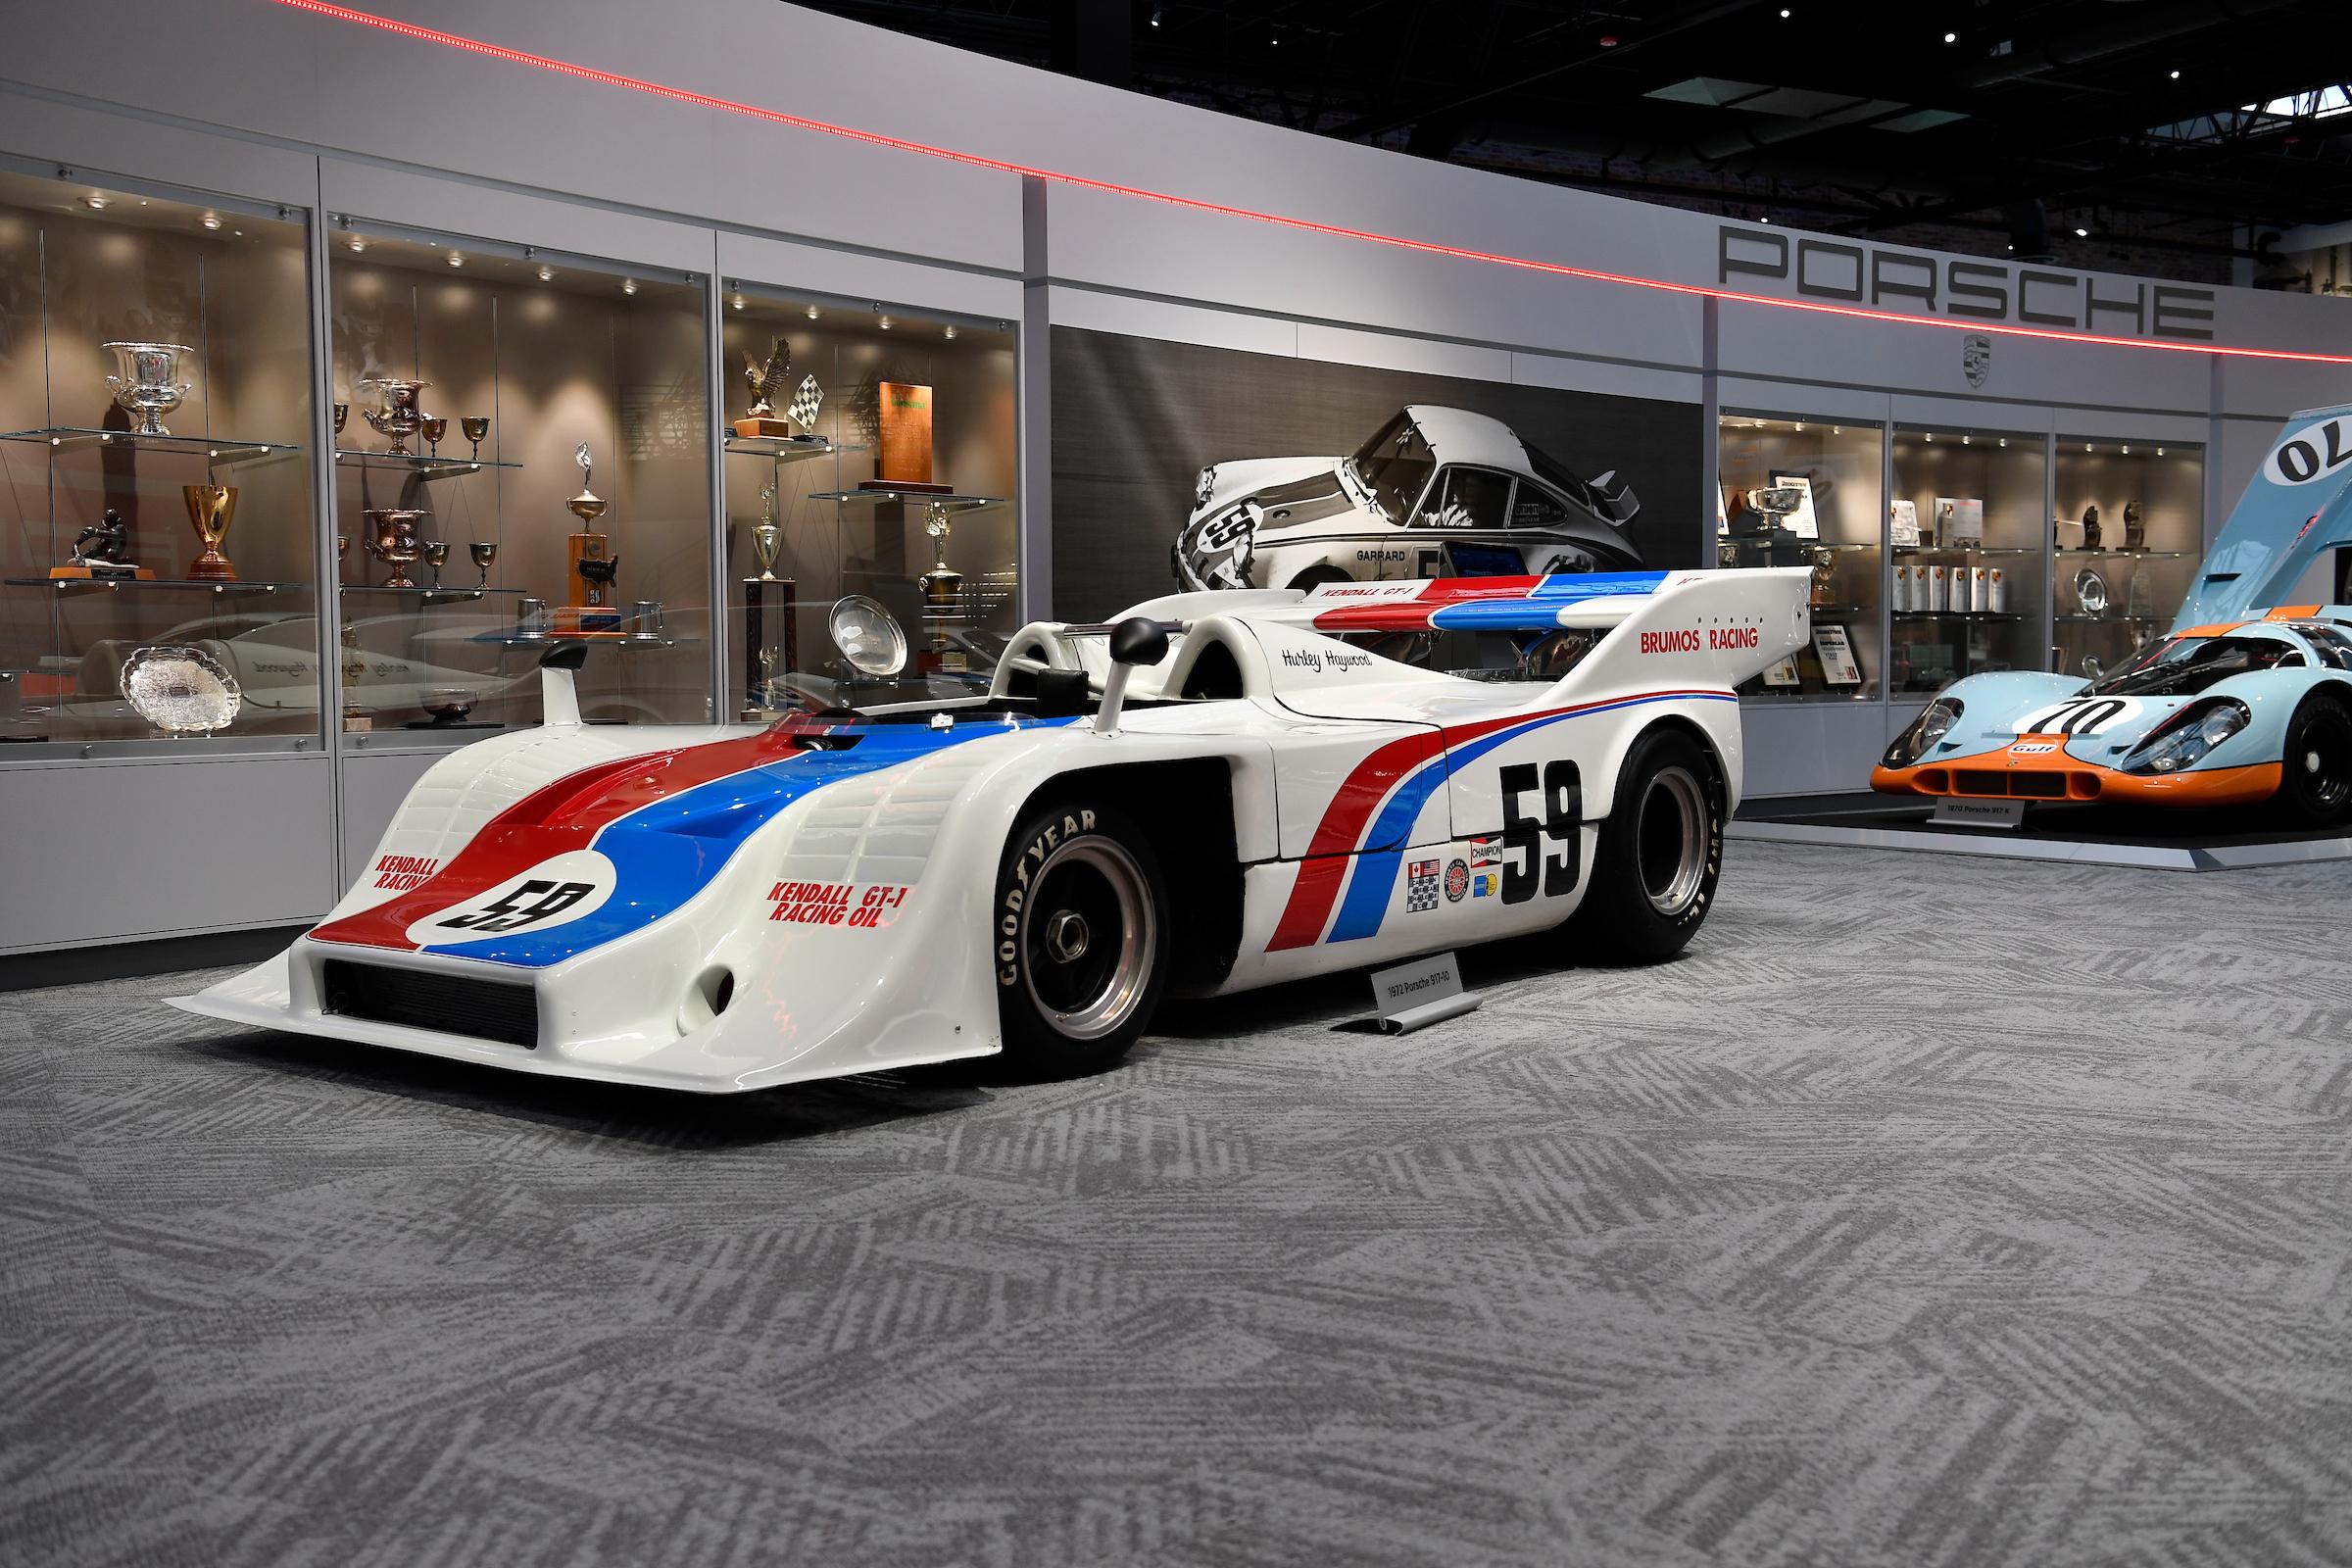 Brumos Collection 1972 Porsche 917-10